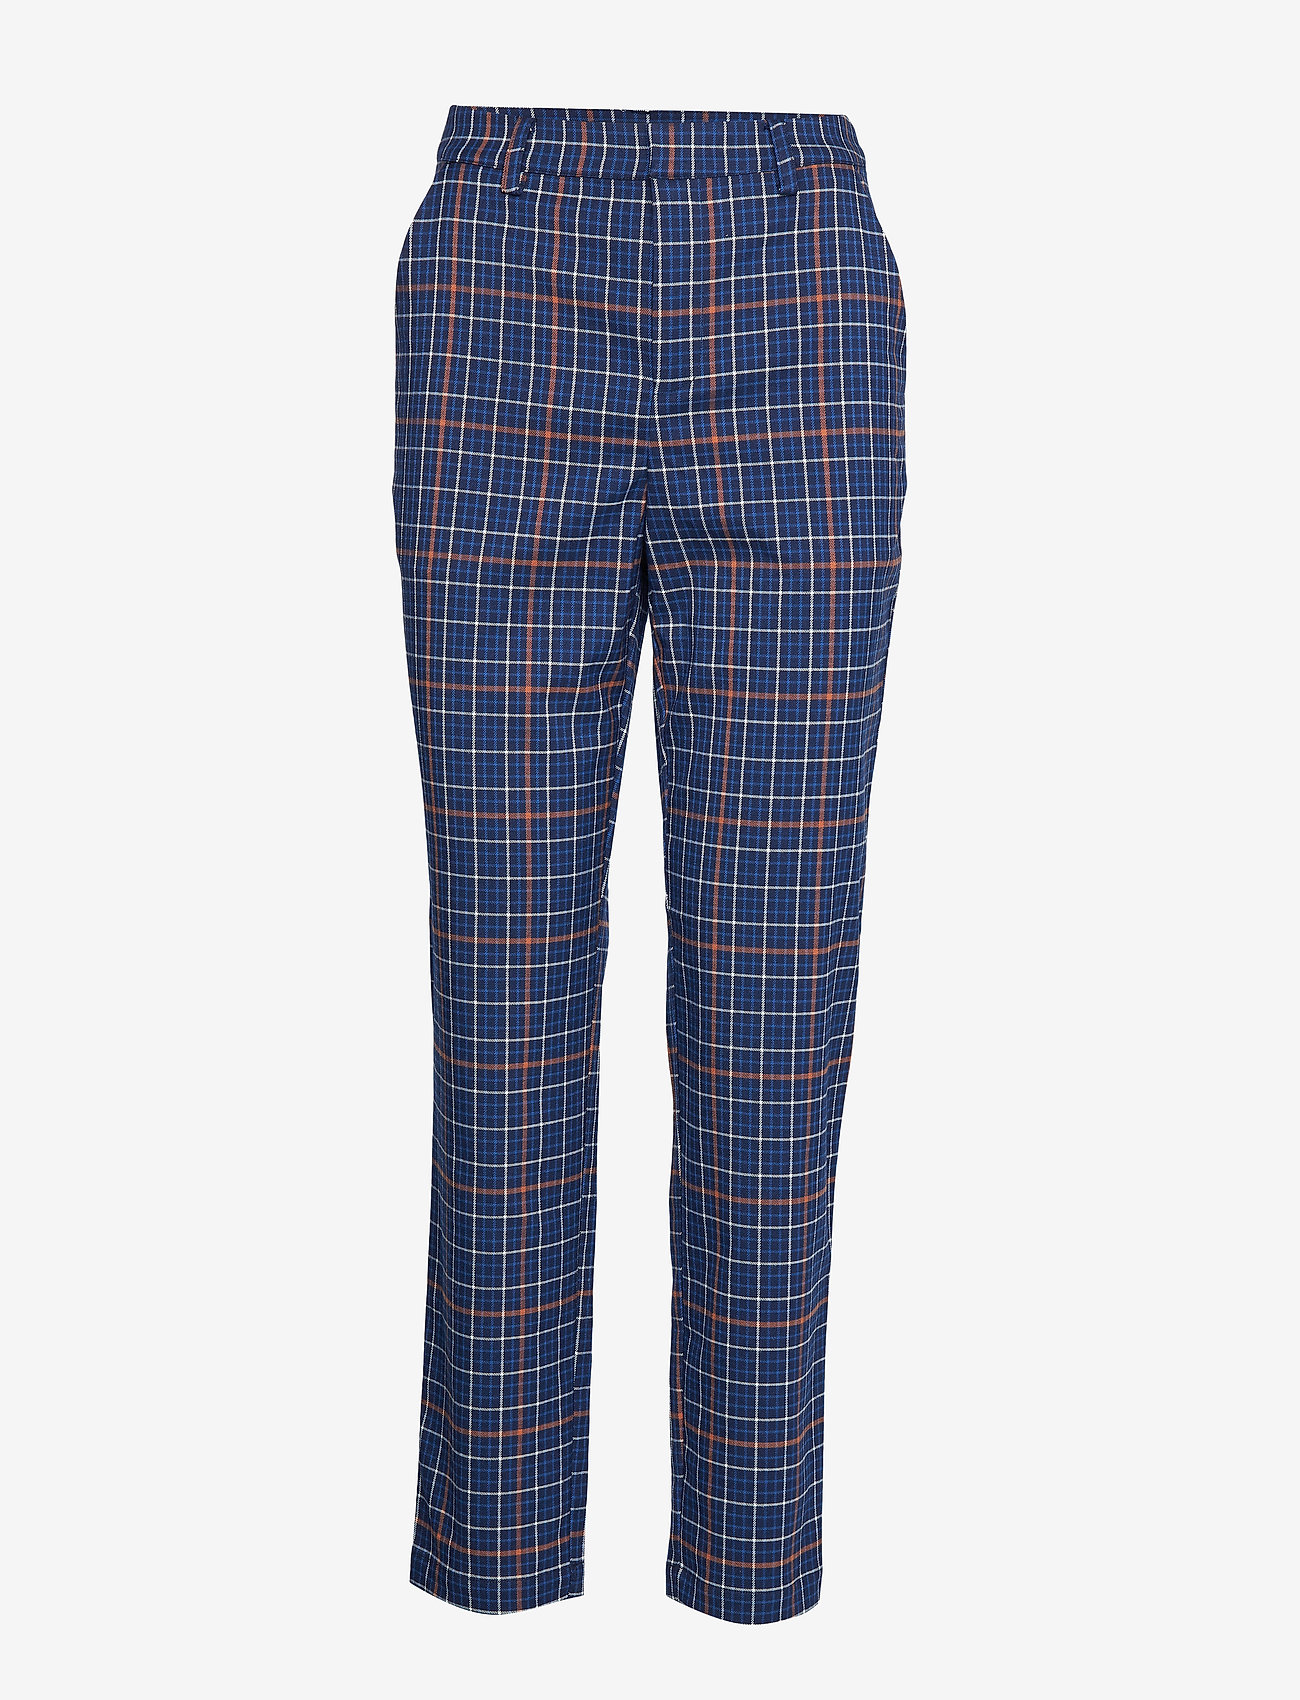 Gestuz - NiraGZ pants MA19 - suorat housut - blue/umber check